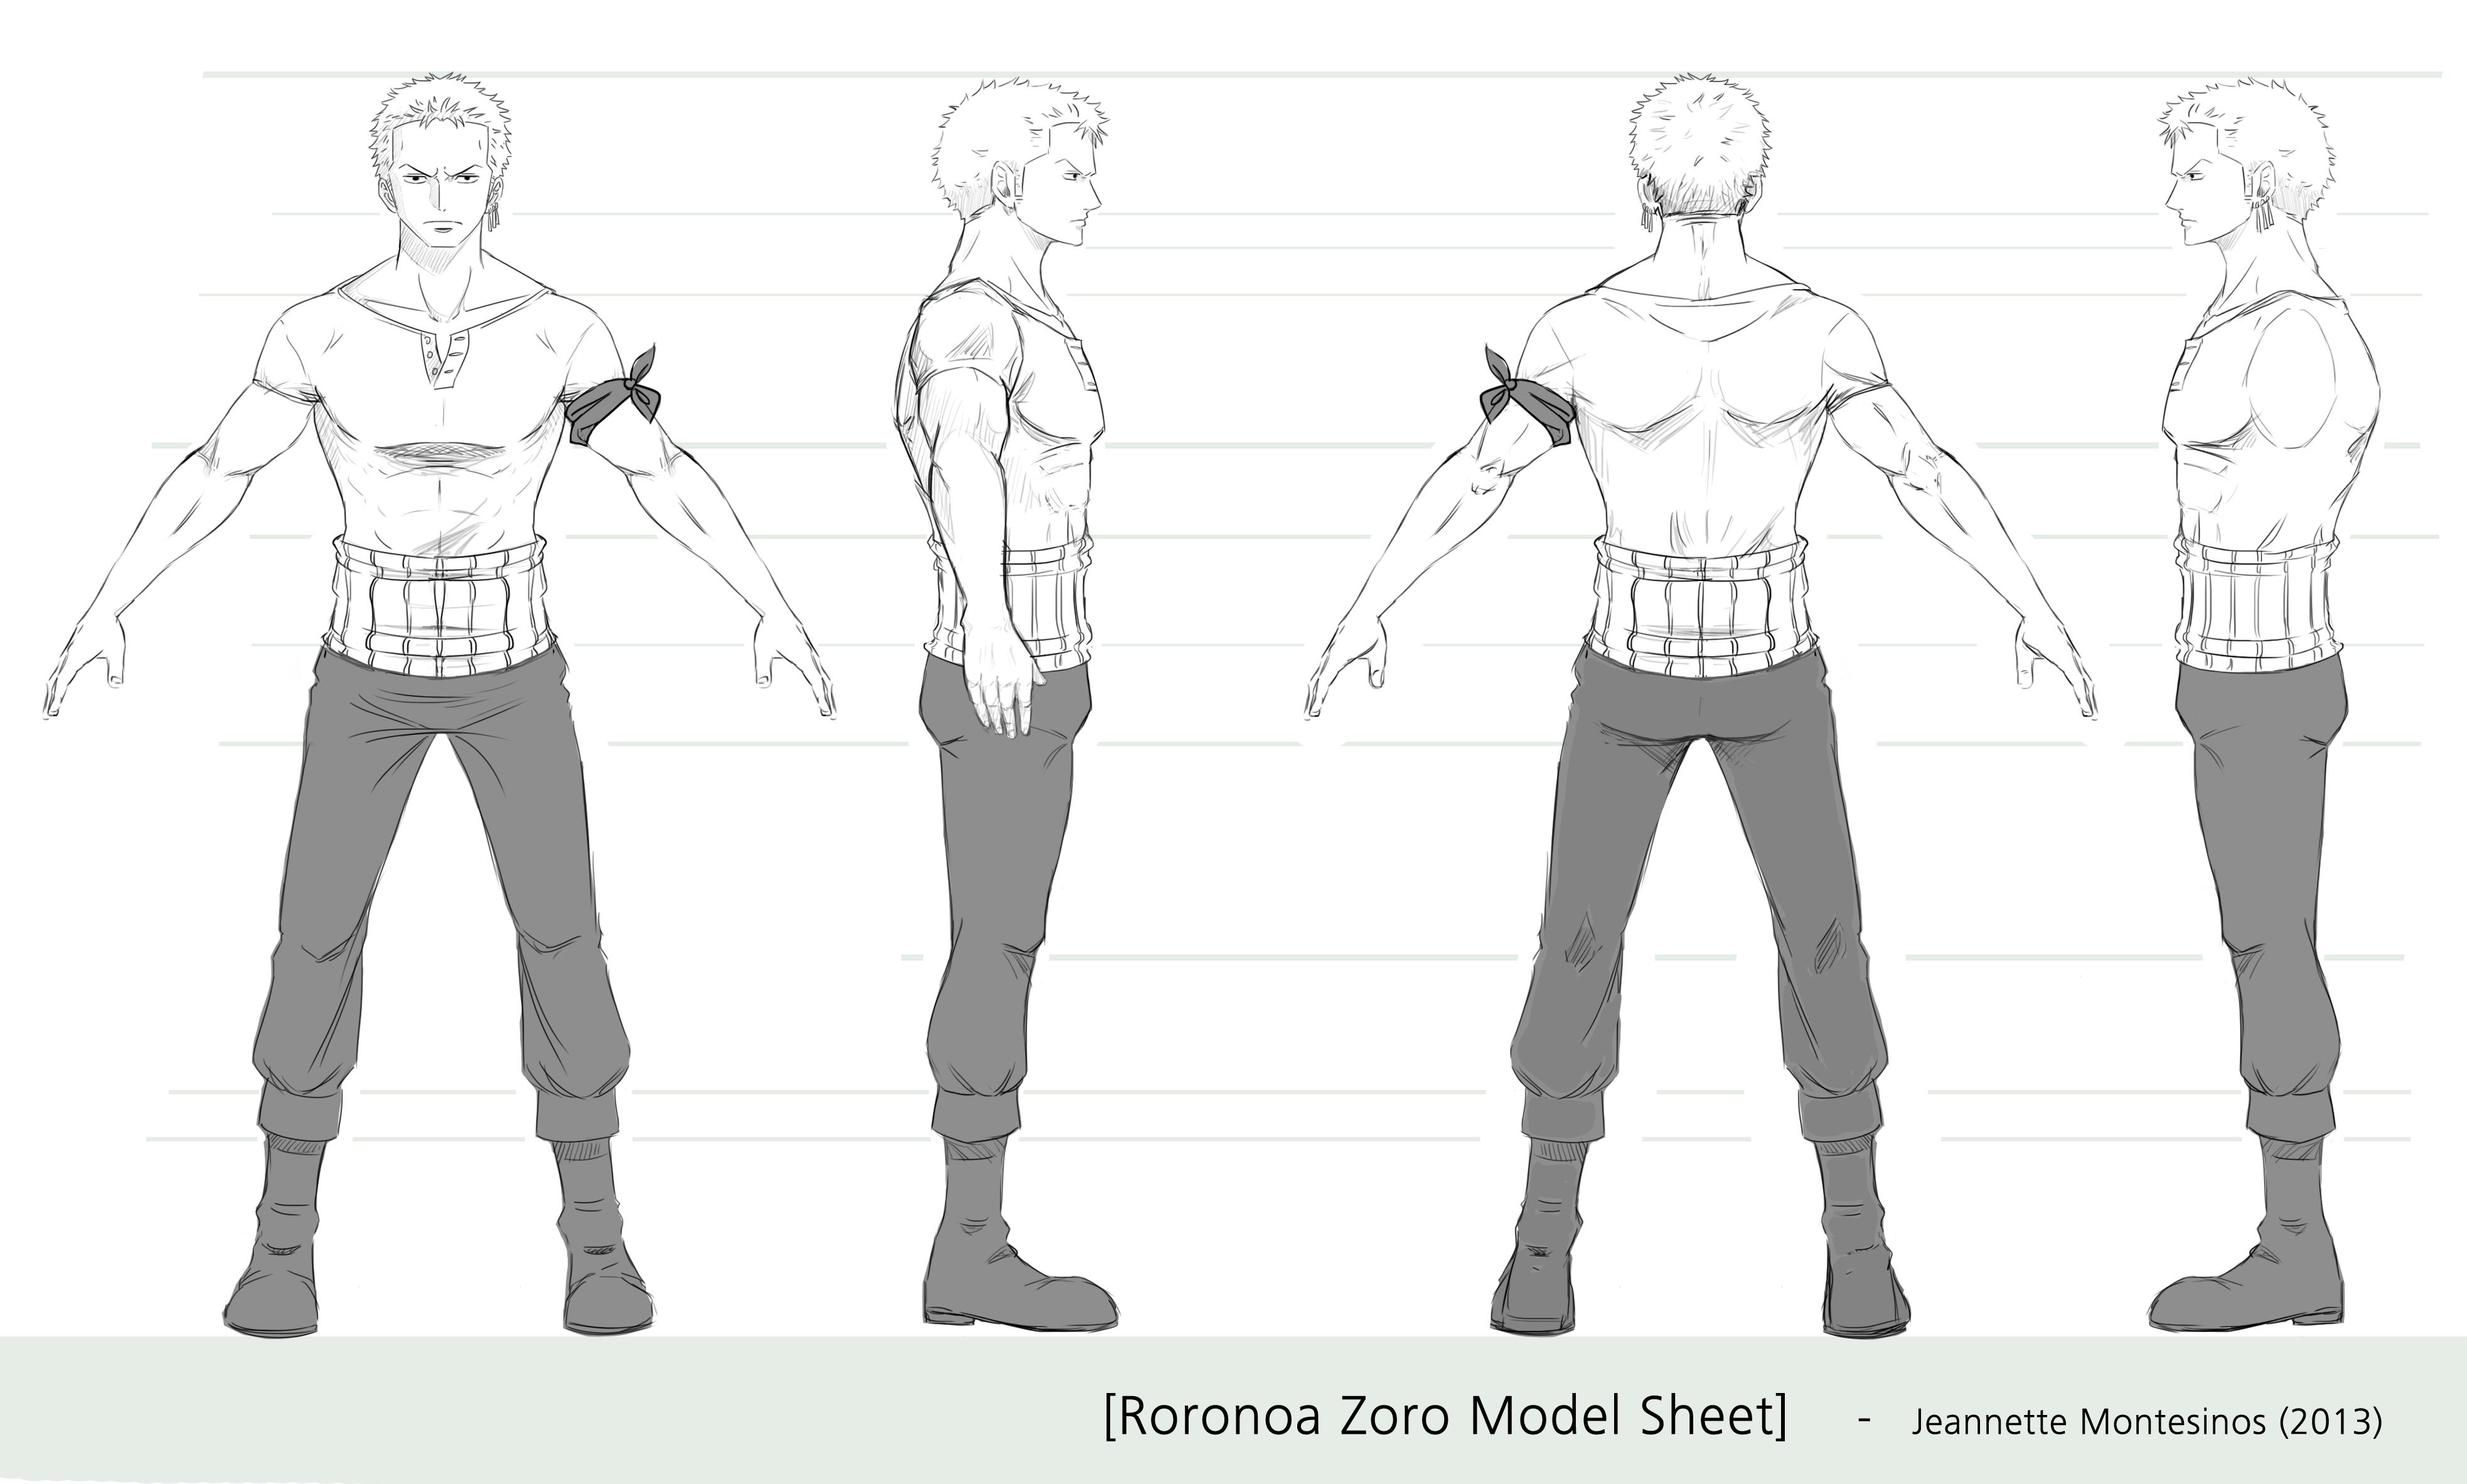 Blender Character Modeling Template : Long weekend workshop blender elbows and forearms